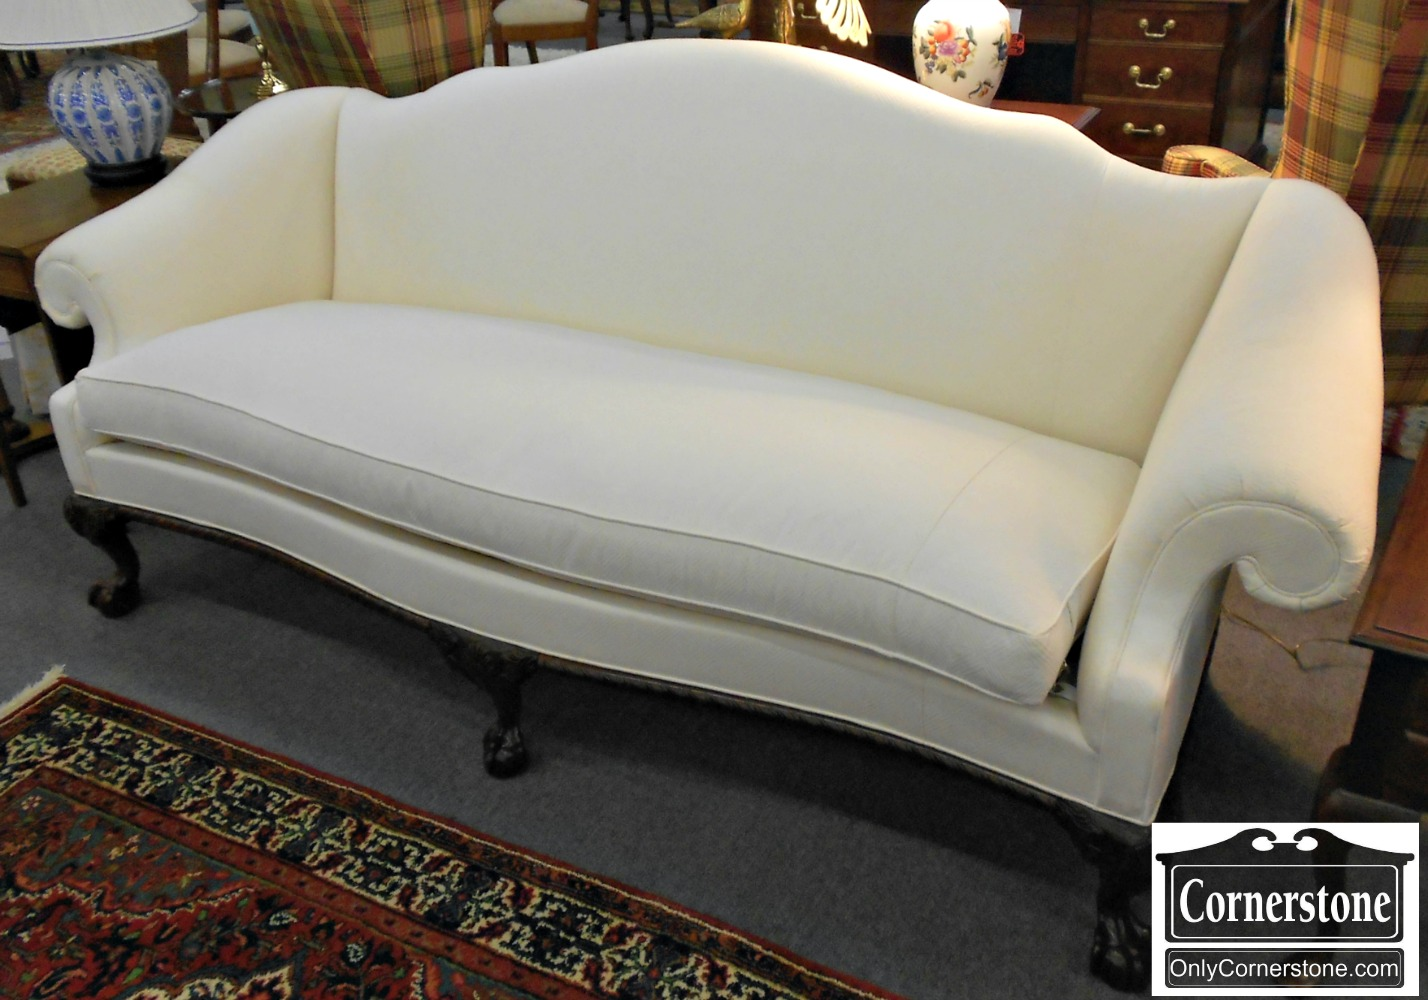 Camelback Sofa Baltimore Maryland Furniture Store